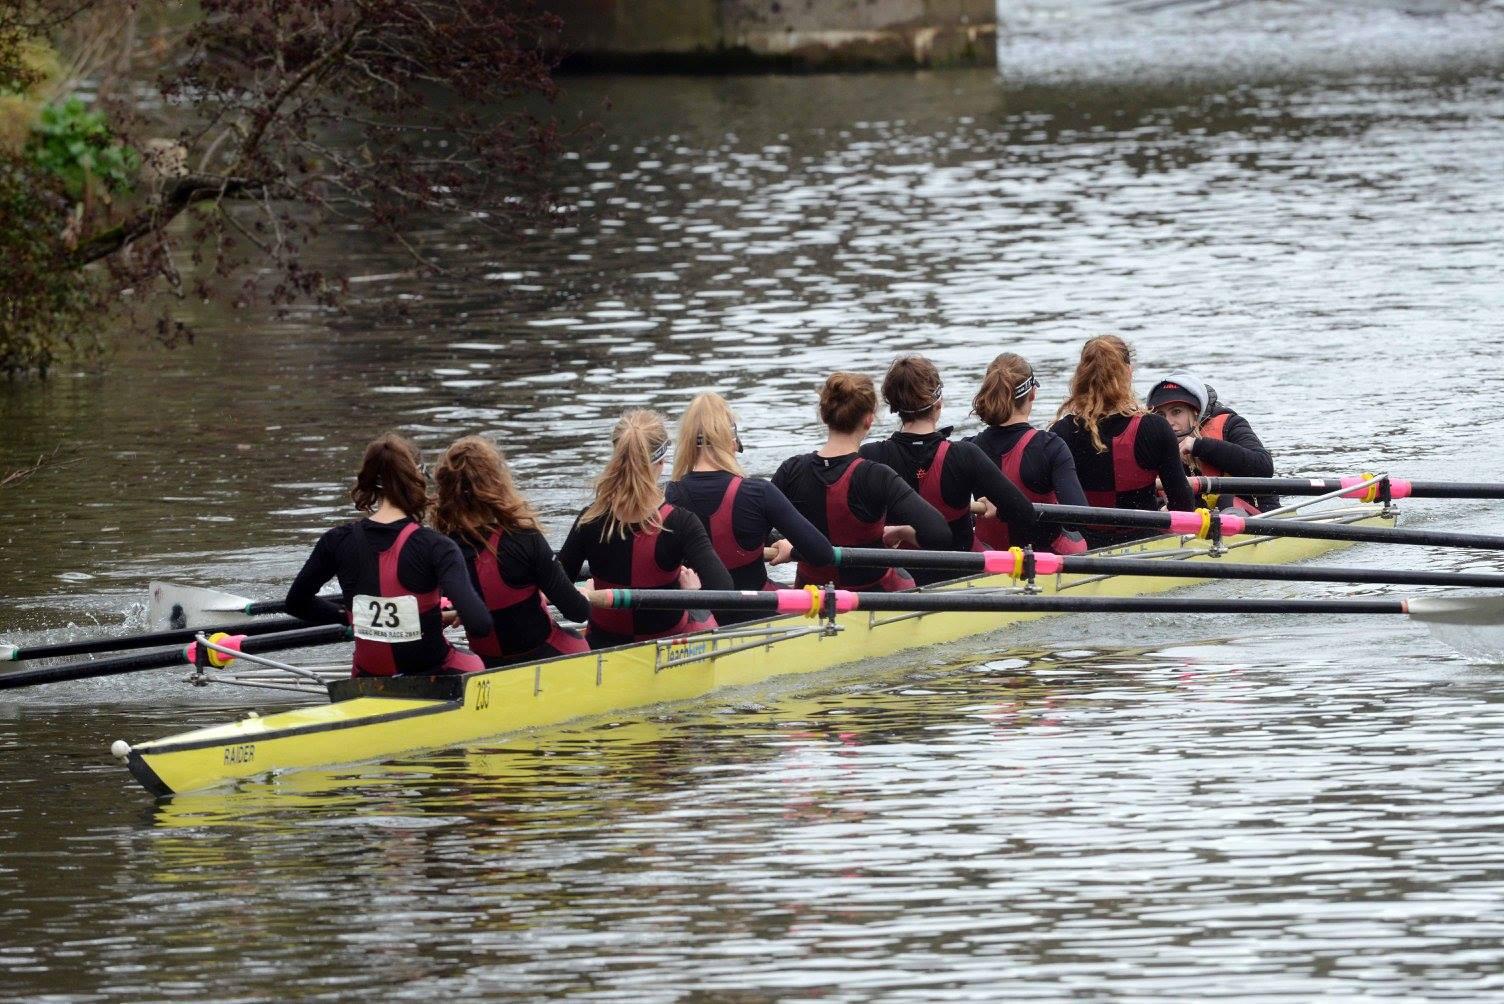 Nonesuch Women's 8, fastest Women's Alumni crew